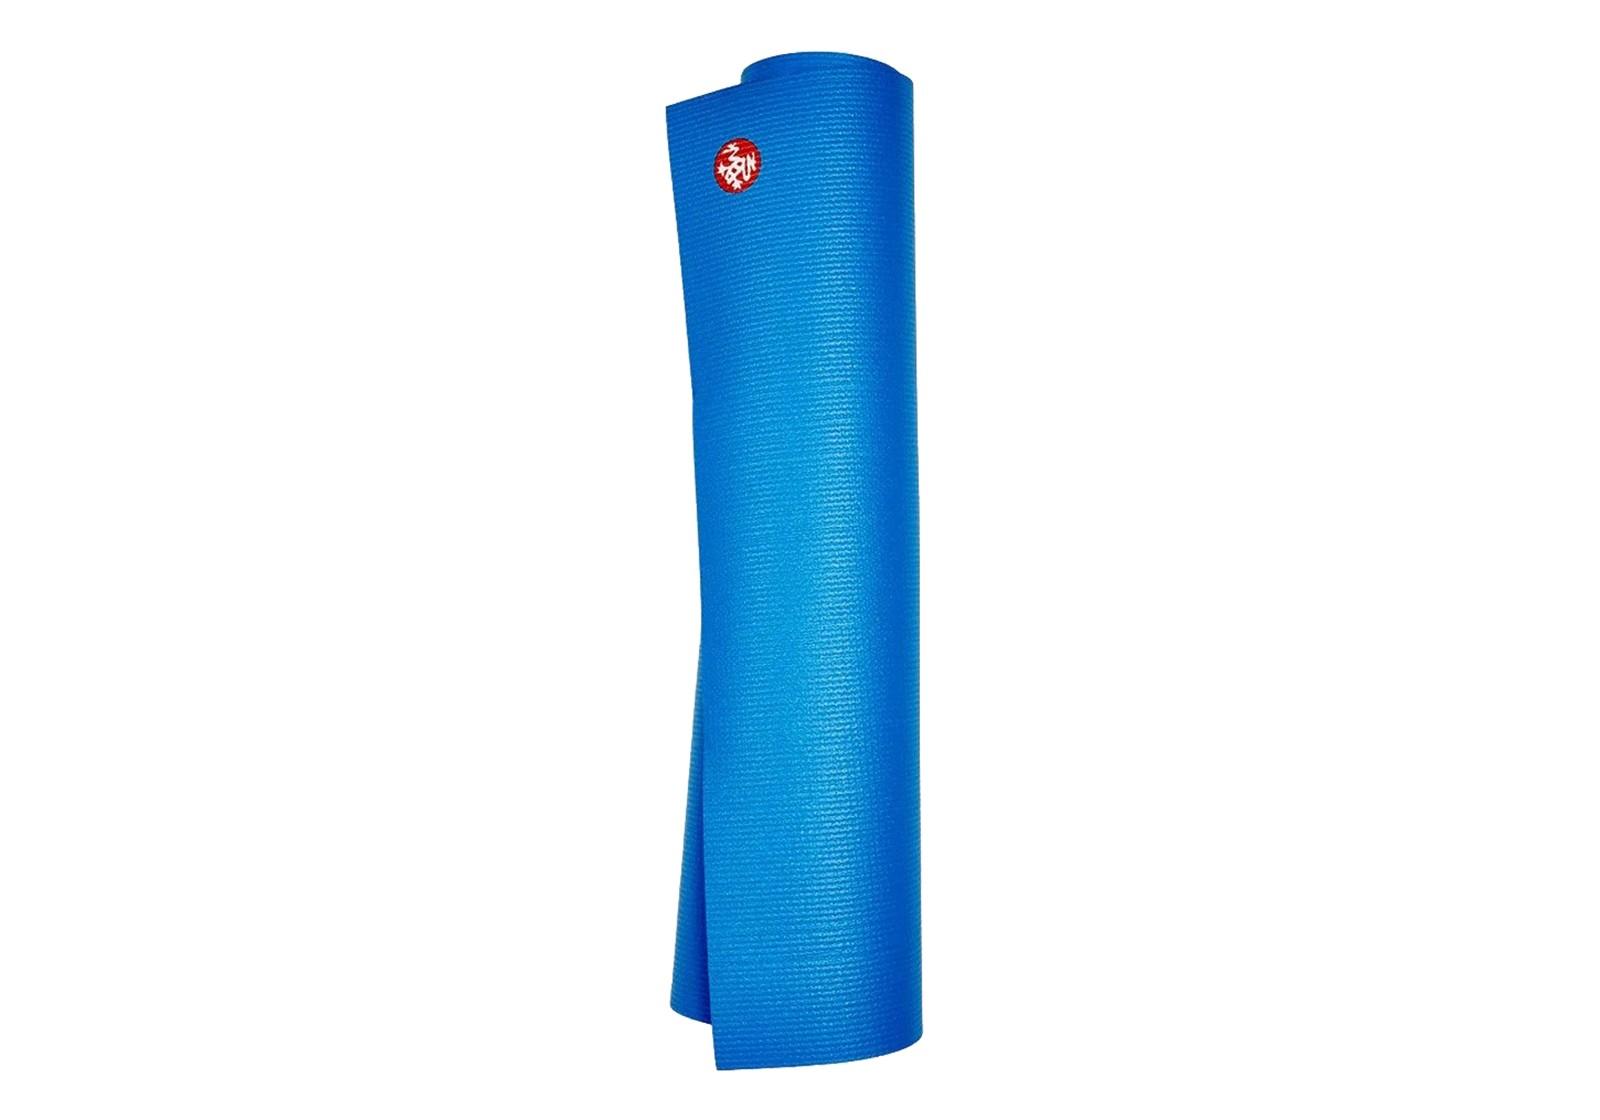 manduka-prolite-be-bold-blue-180x61x047-4